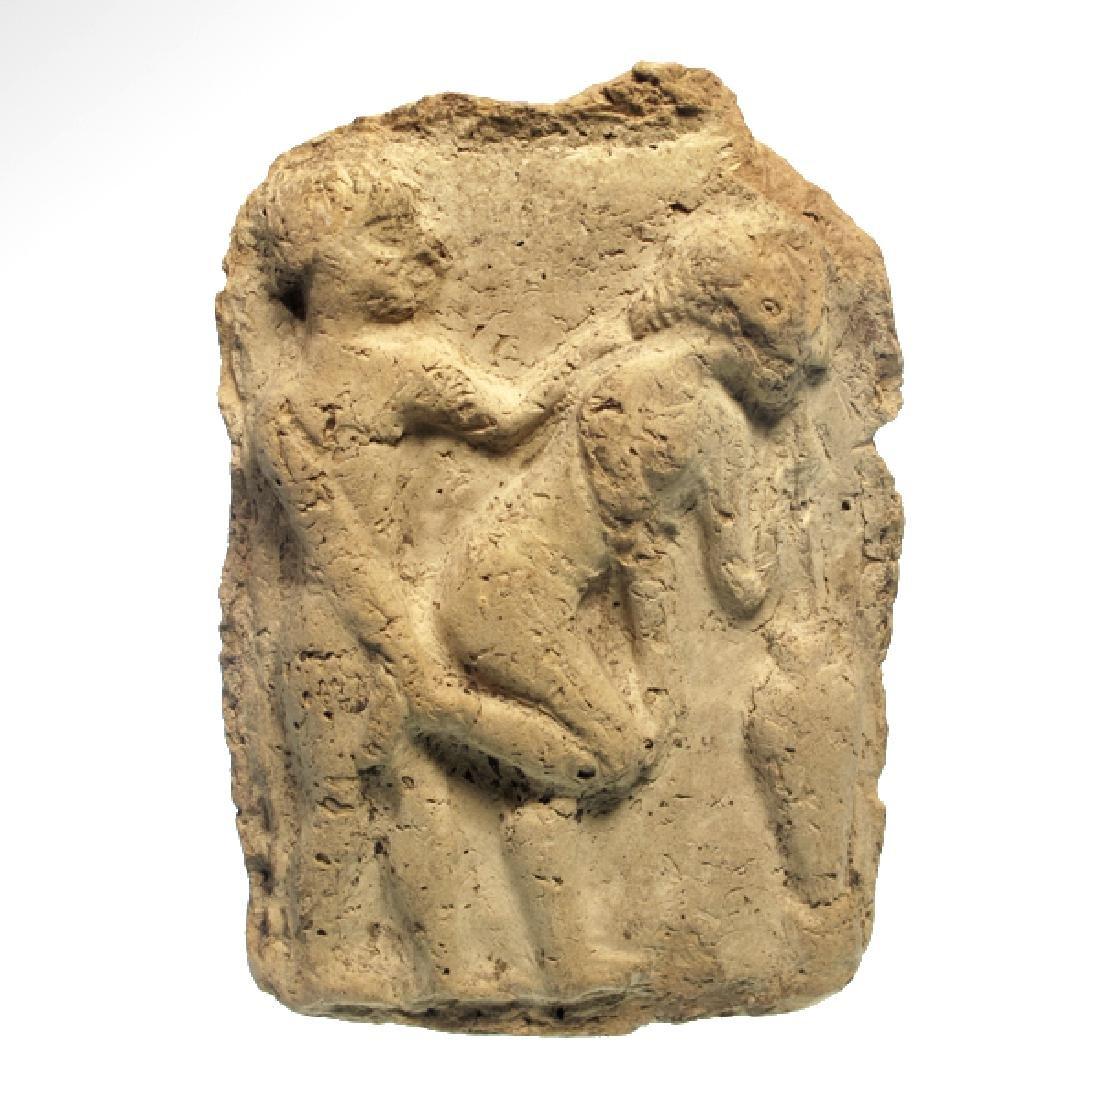 Babylonian Erotic Plaque, c. 1800 B.C.